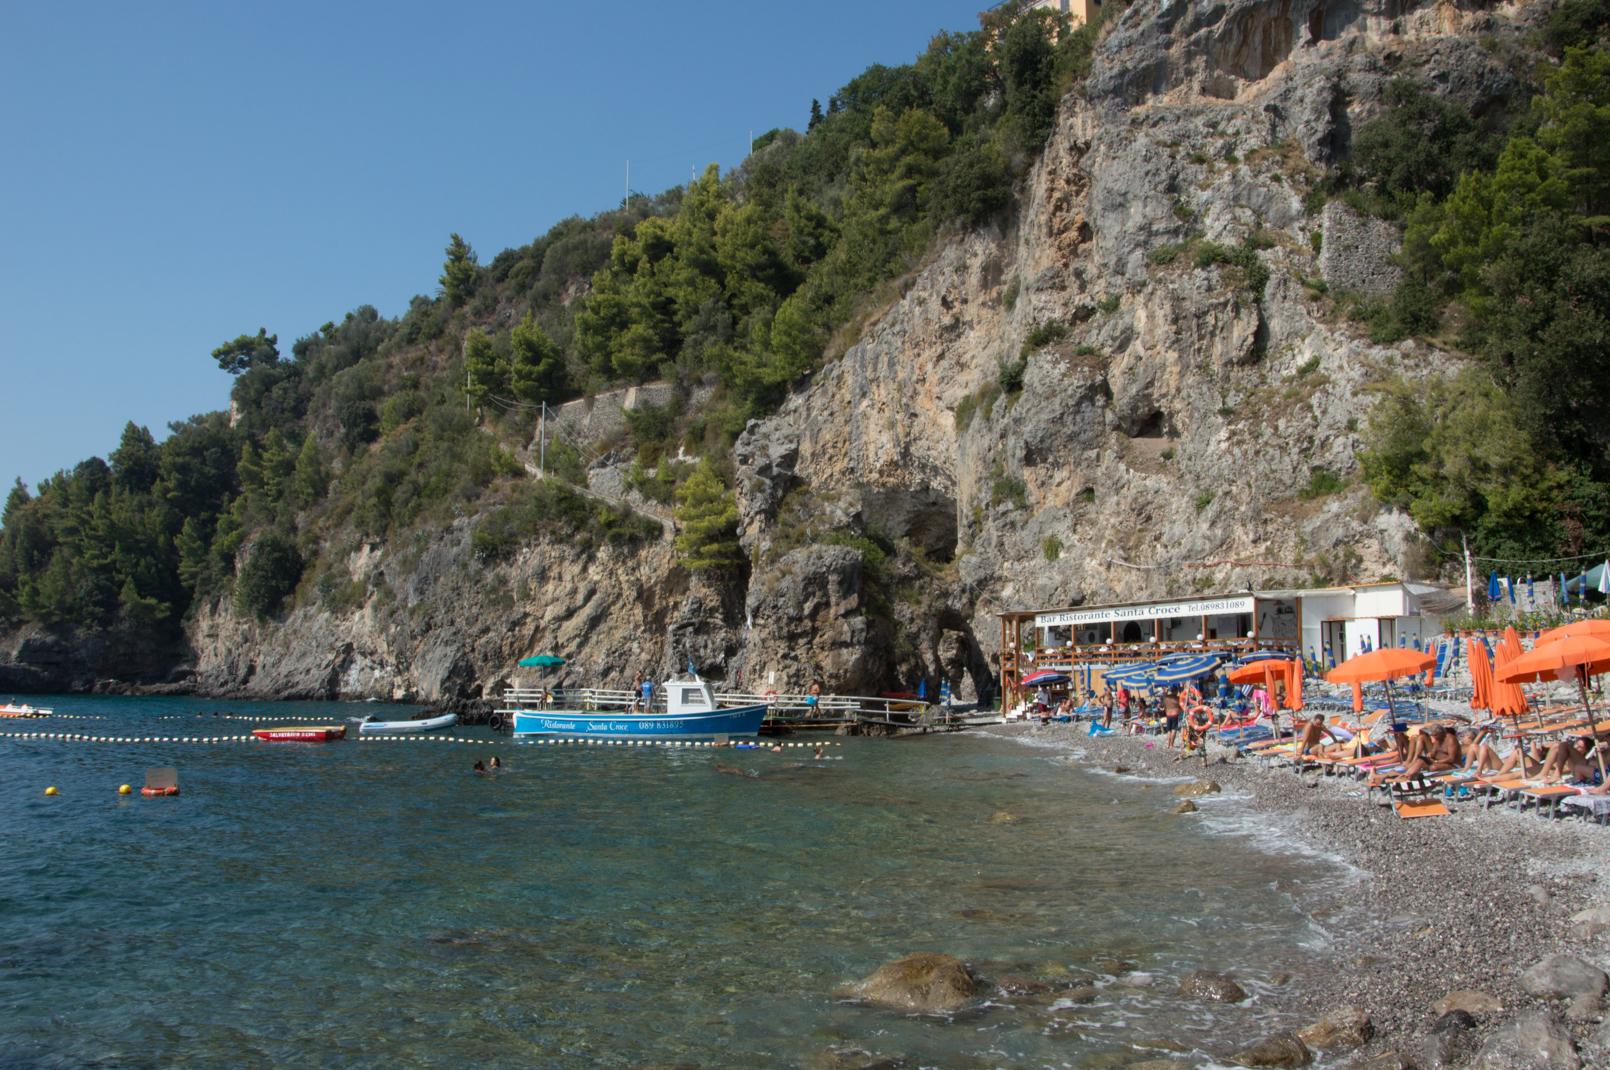 ciao-amalfi-santa-croce-beach-3